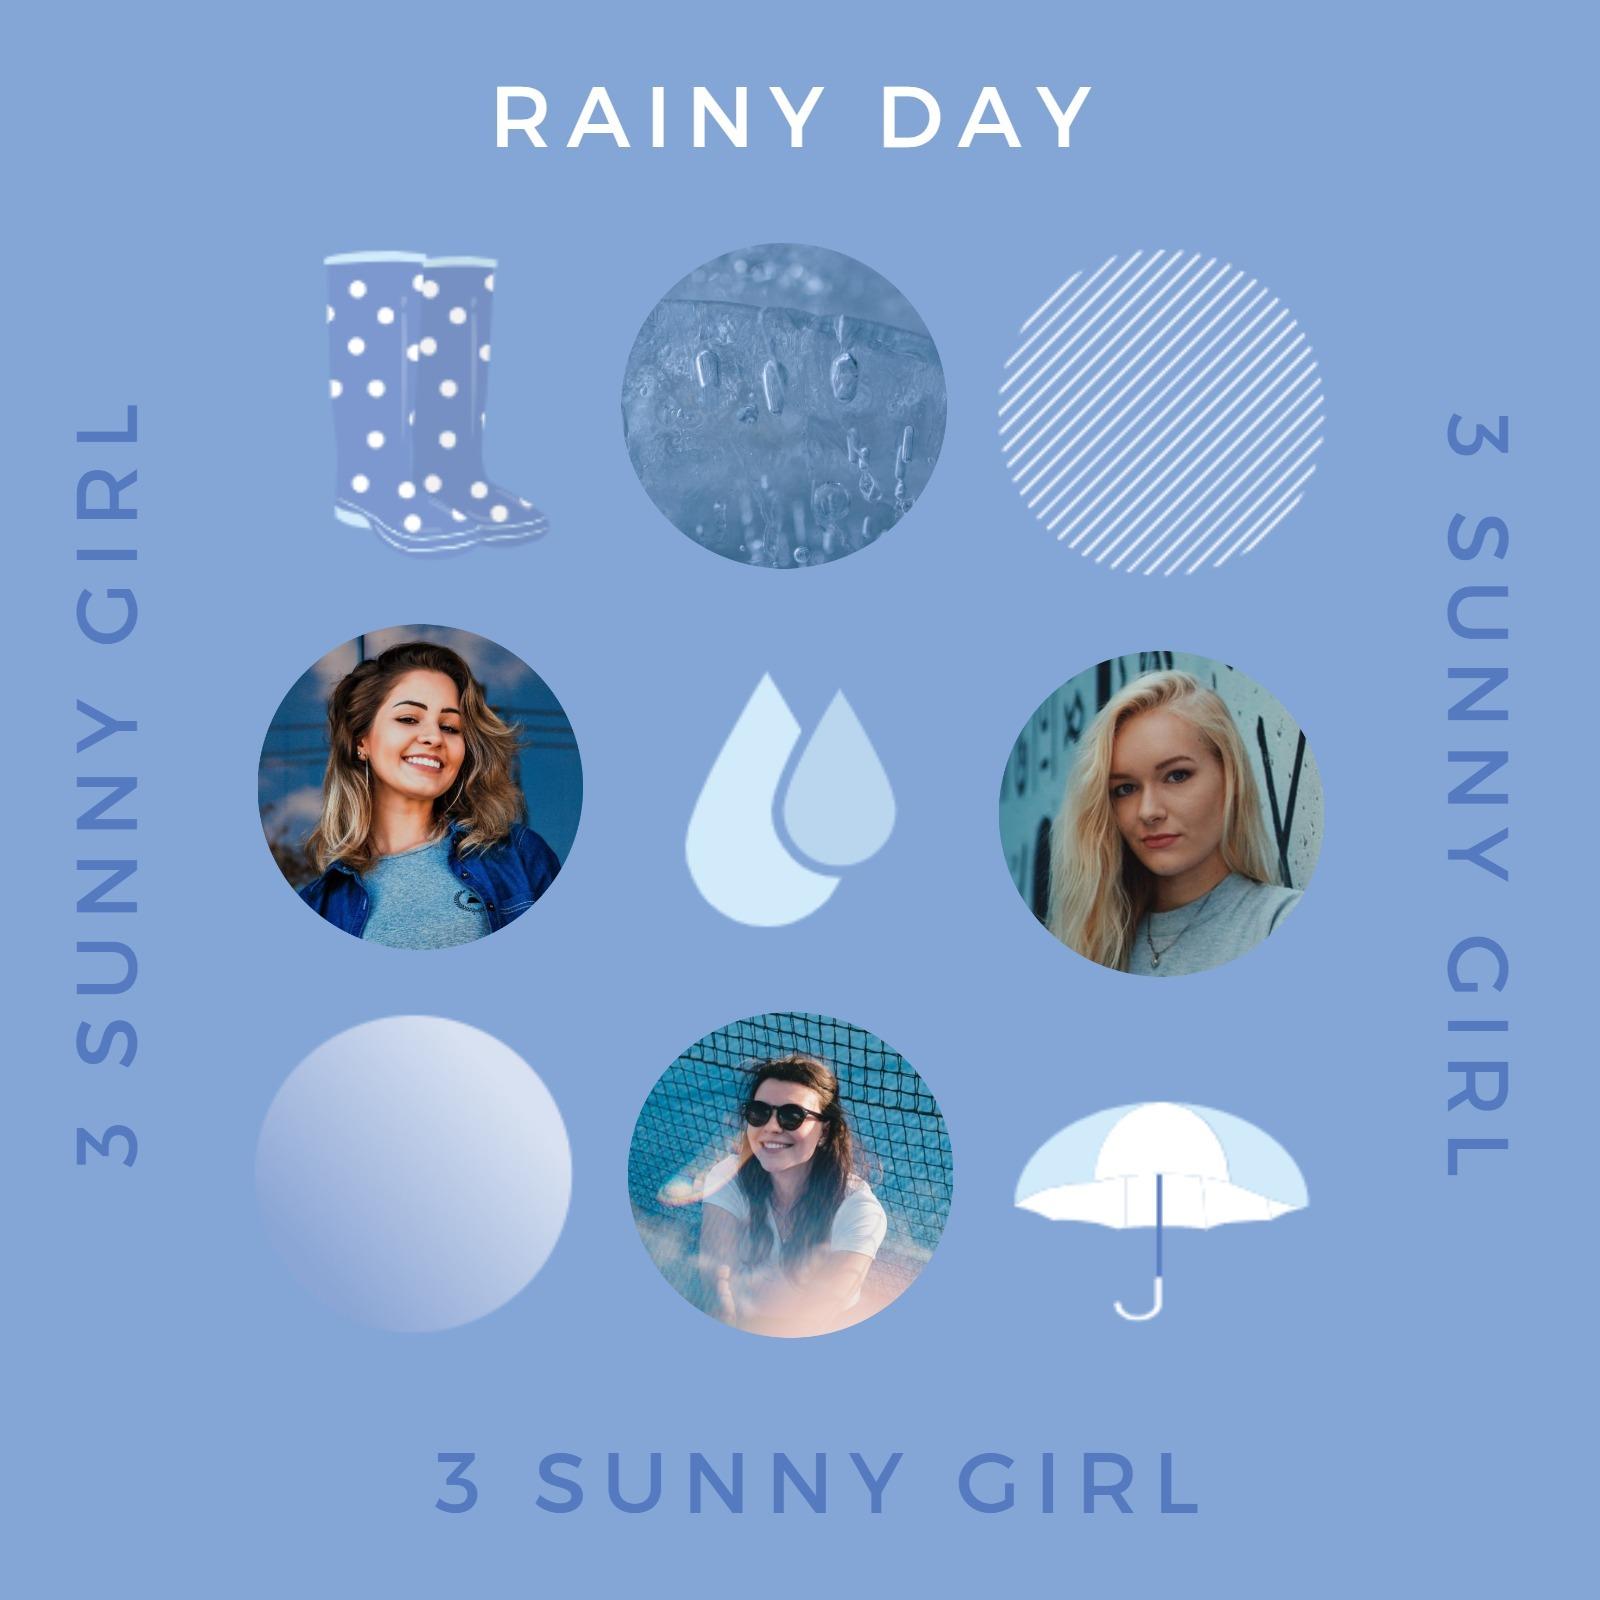 rainy2_wl_20200116